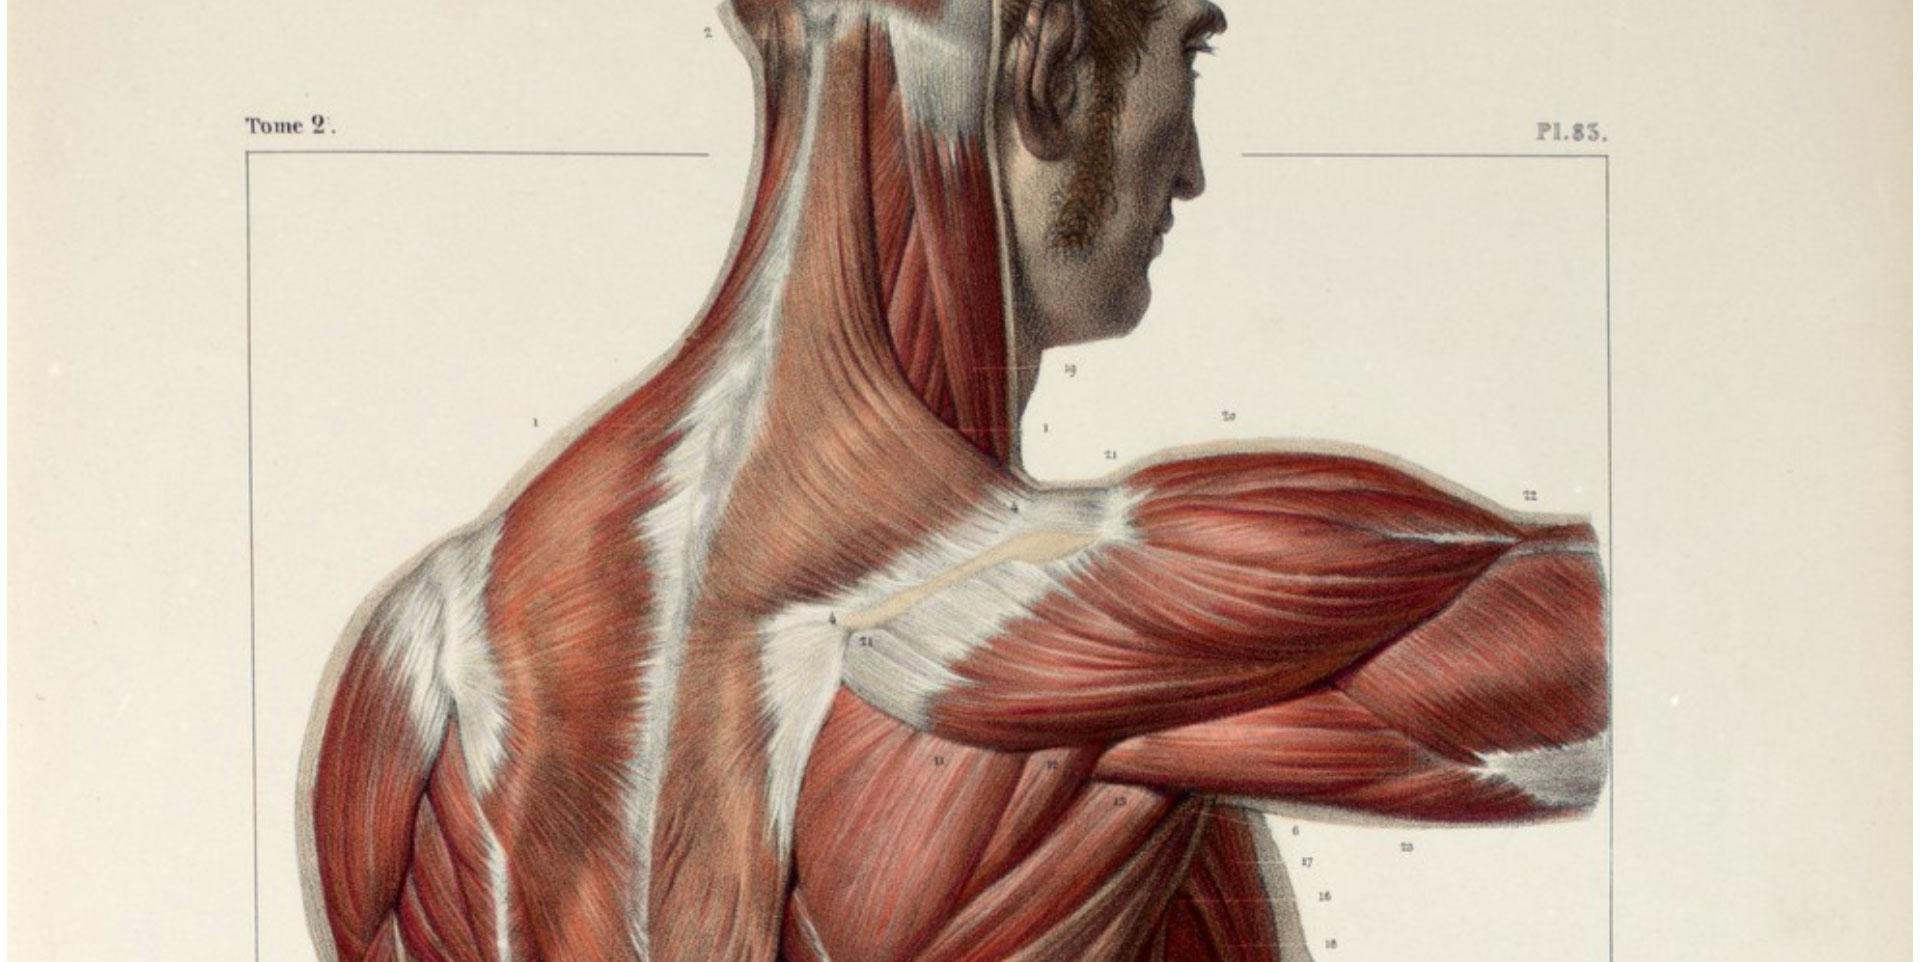 Anatomia Collection: anatomical plates 1522-1867 | Anatomical Plates ...